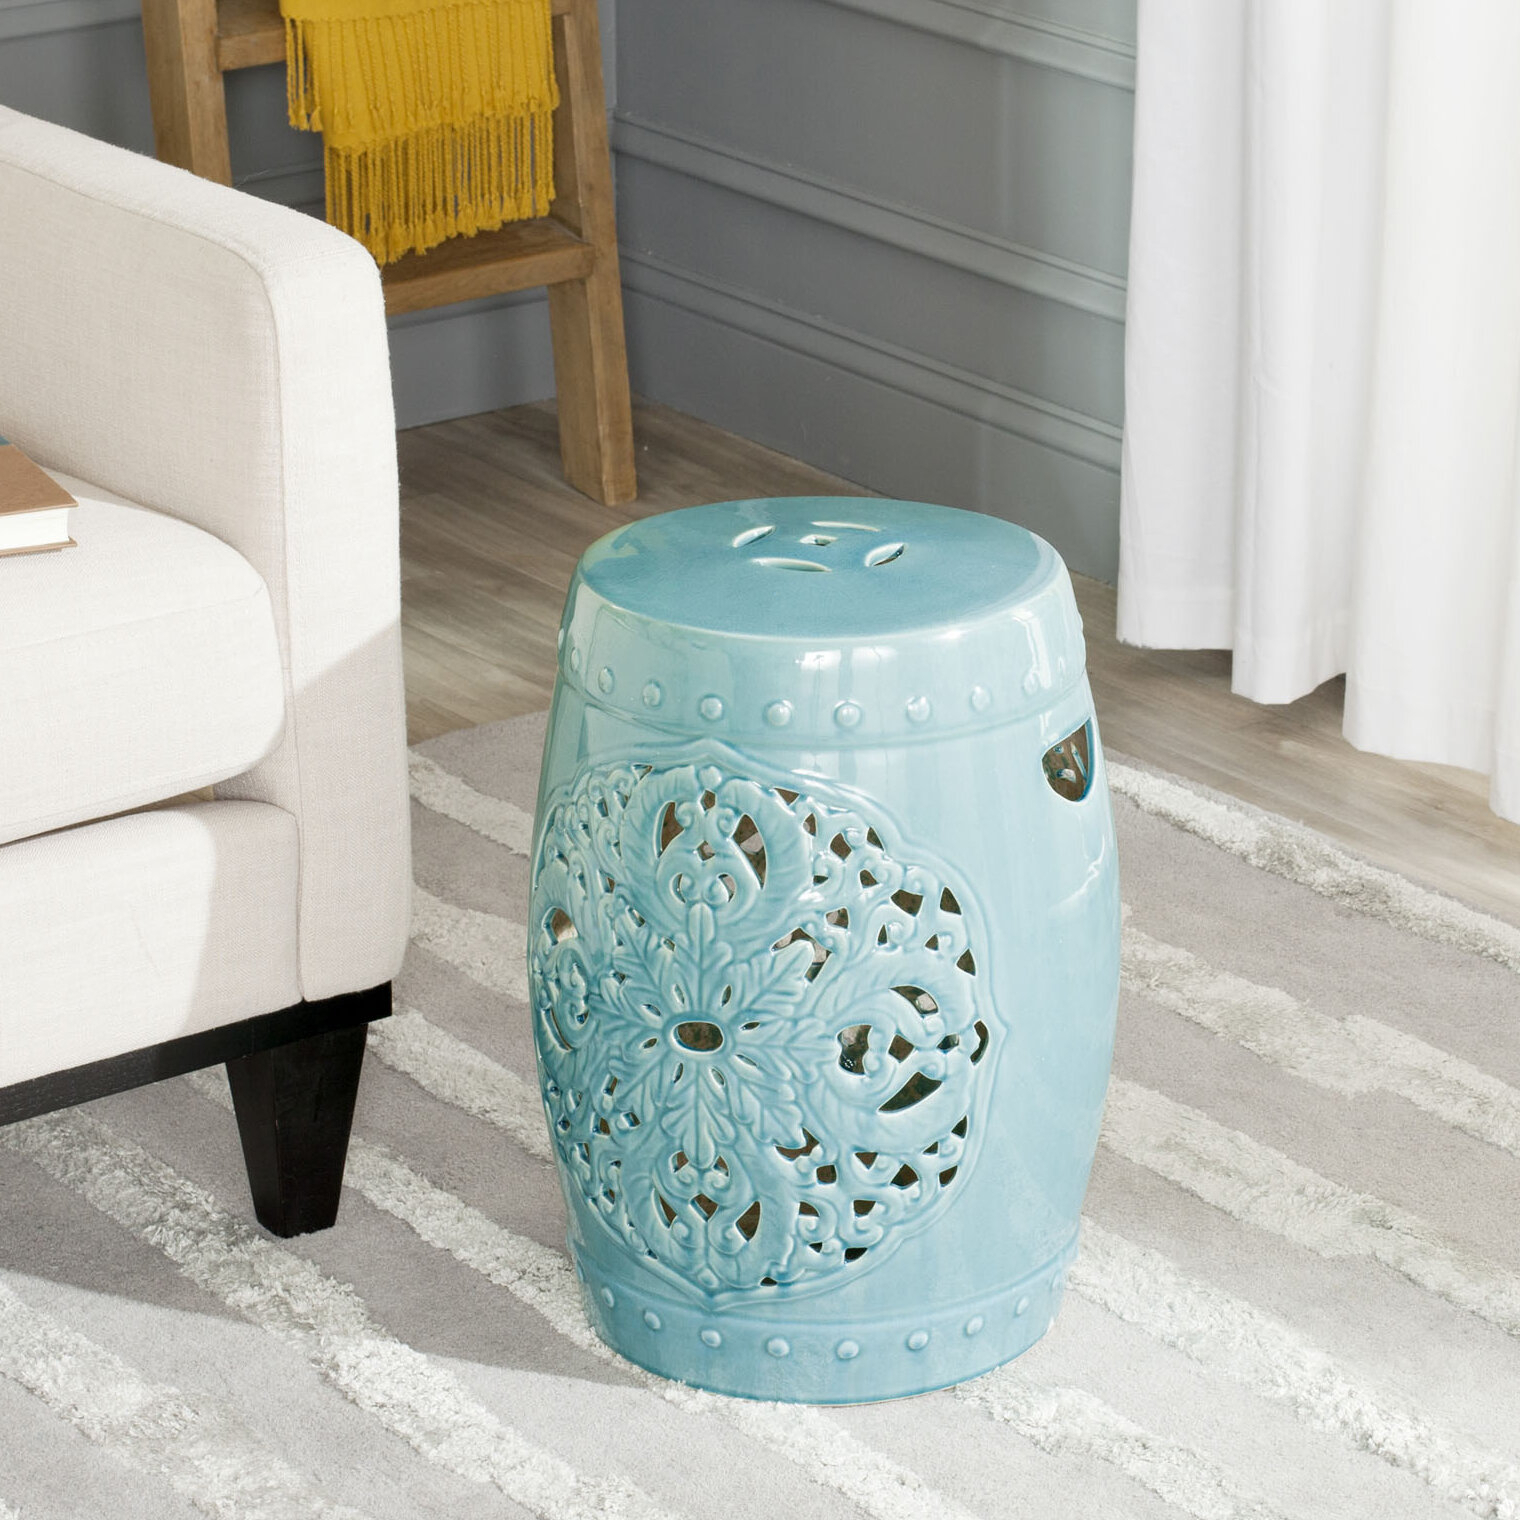 Nagle Ceramic Garden Stool With Regard To Holbrook Ceramic Garden Stools (View 8 of 25)